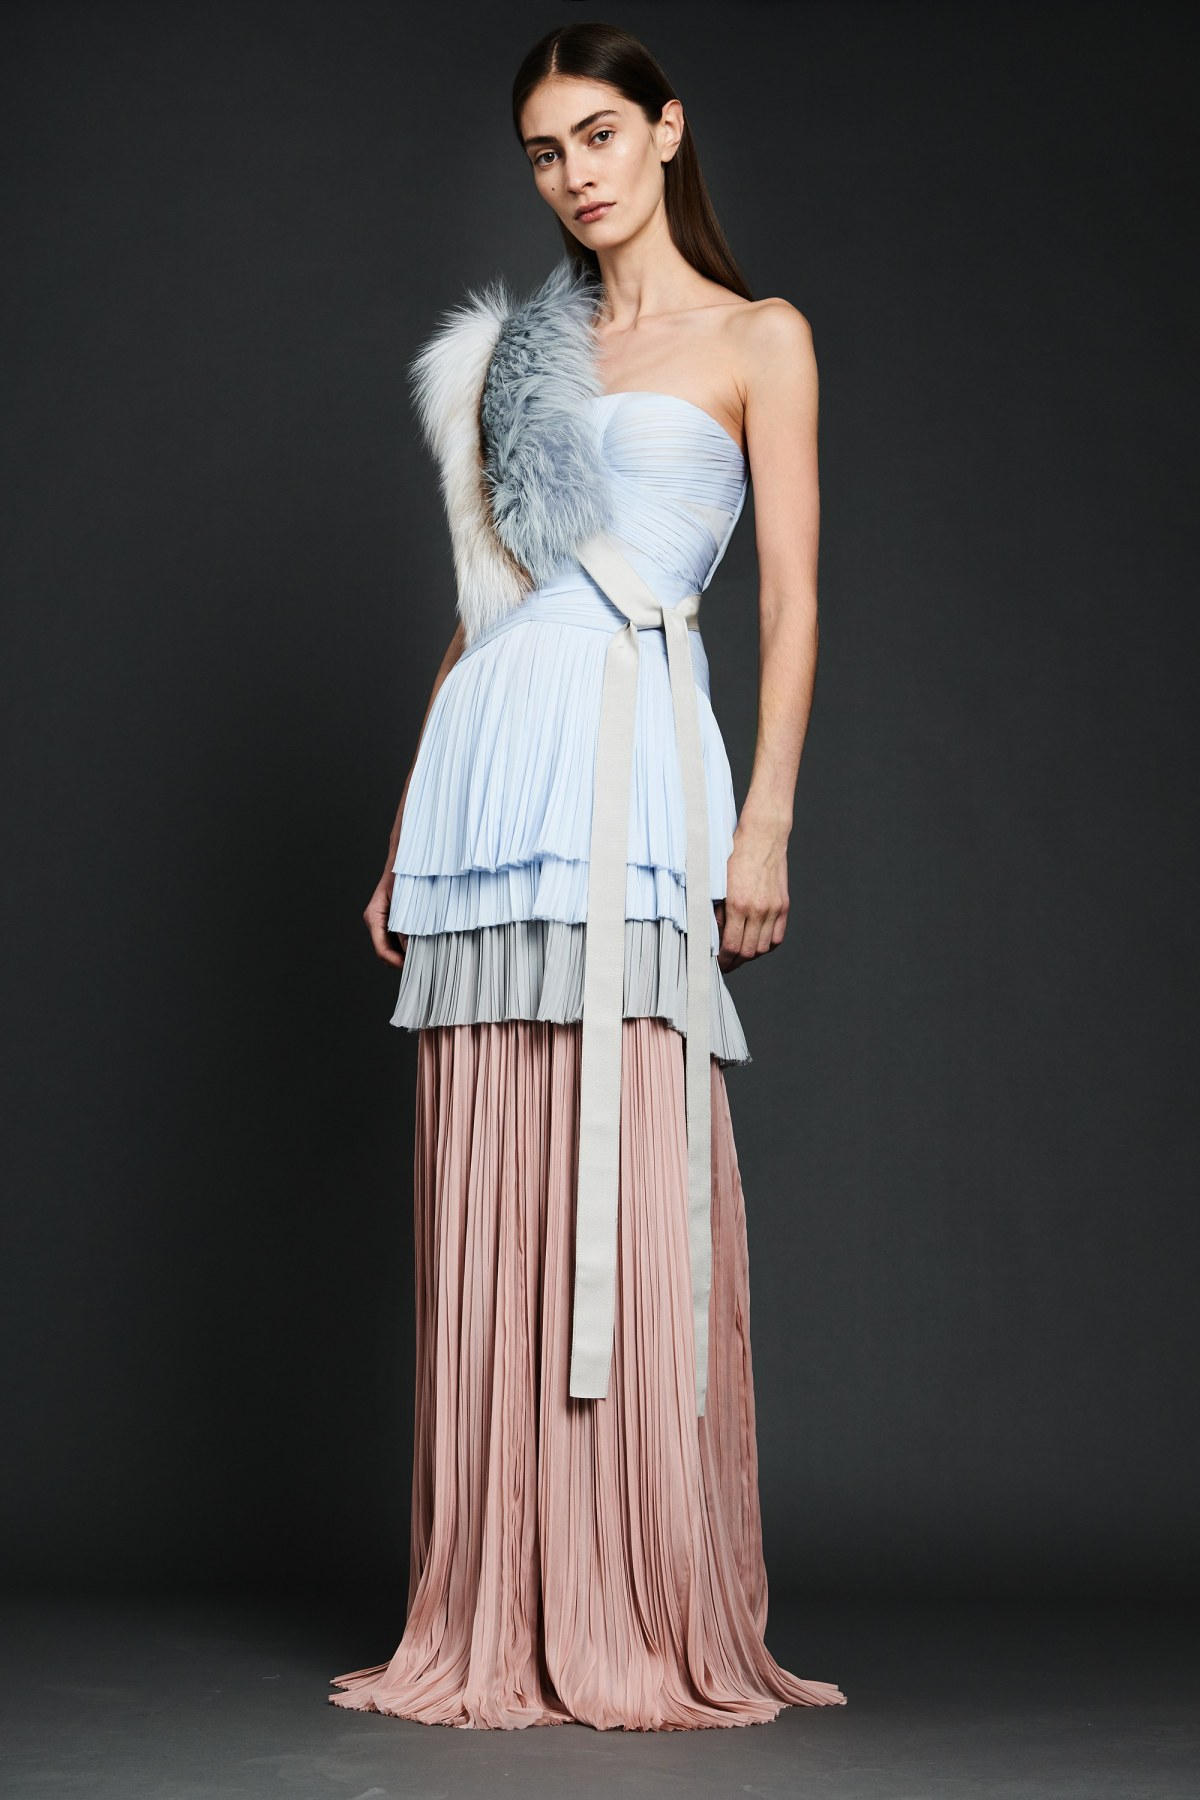 j-mendel-pre-fall-2017-fashion-show-the-impression-27